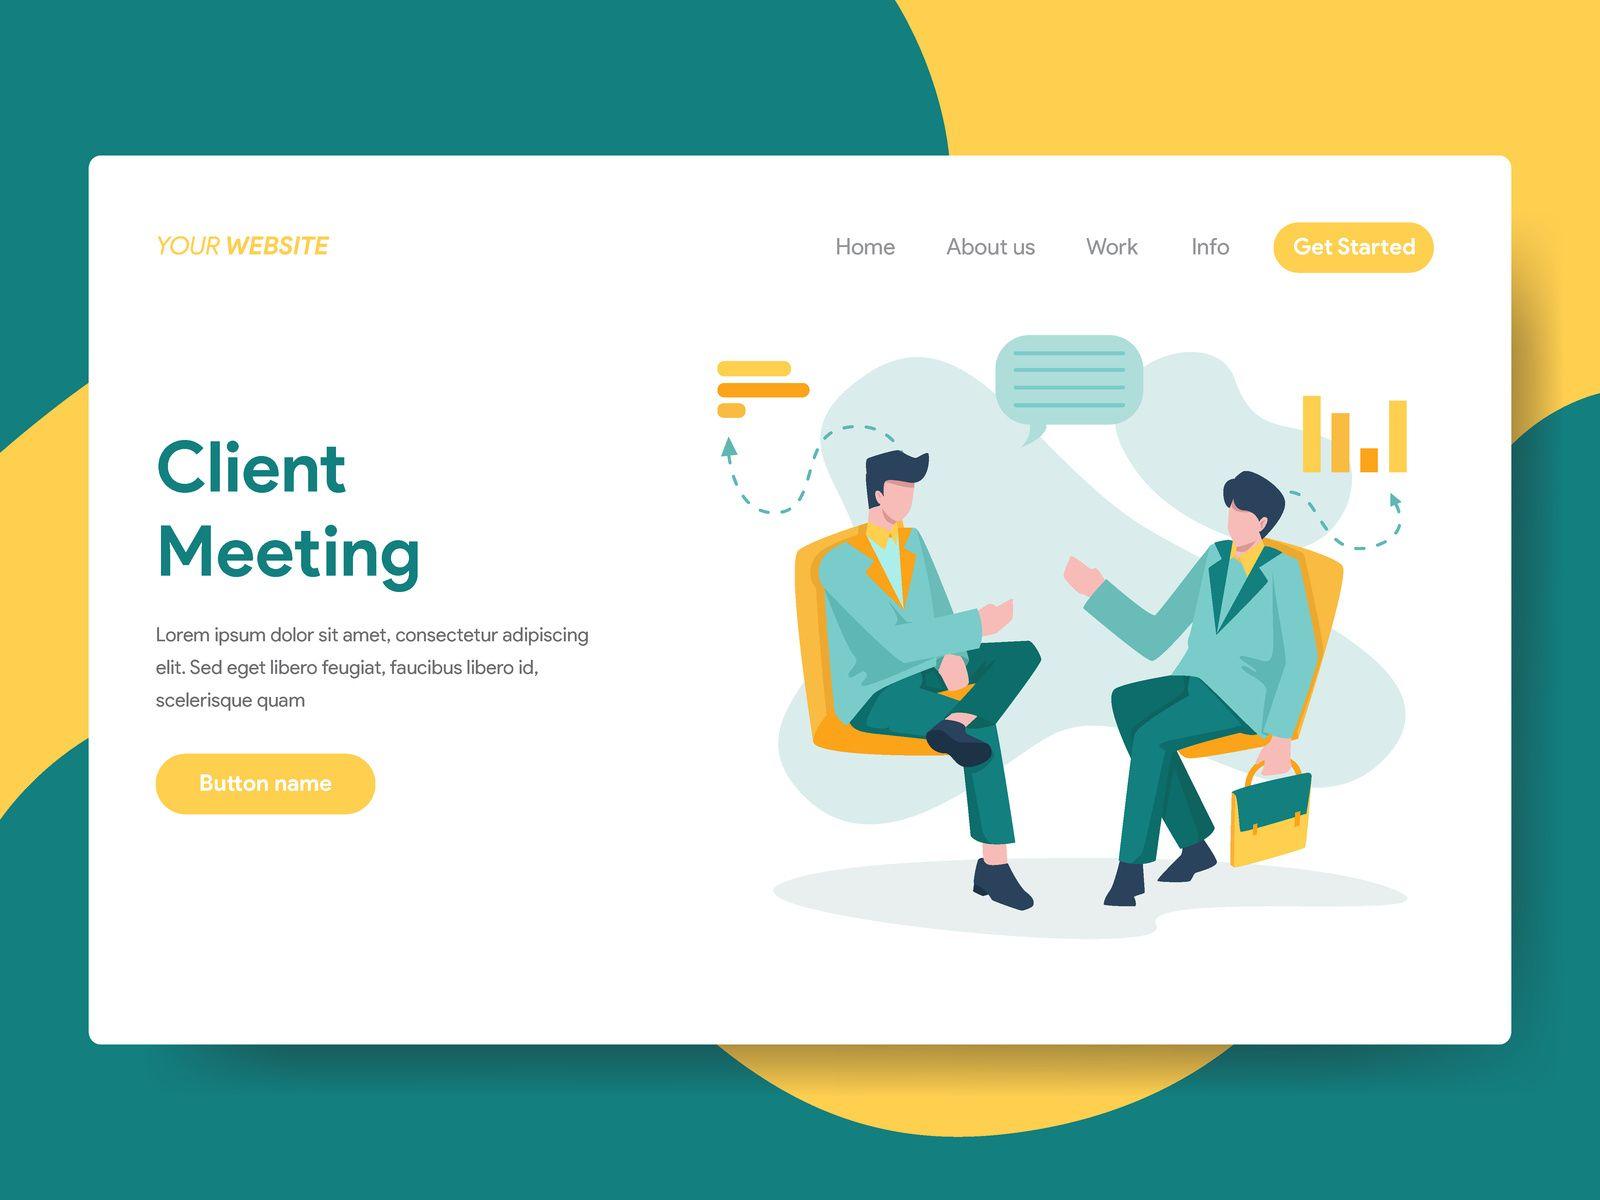 Client Meeting Illustration Web Design Web Design Trends Clean Websites